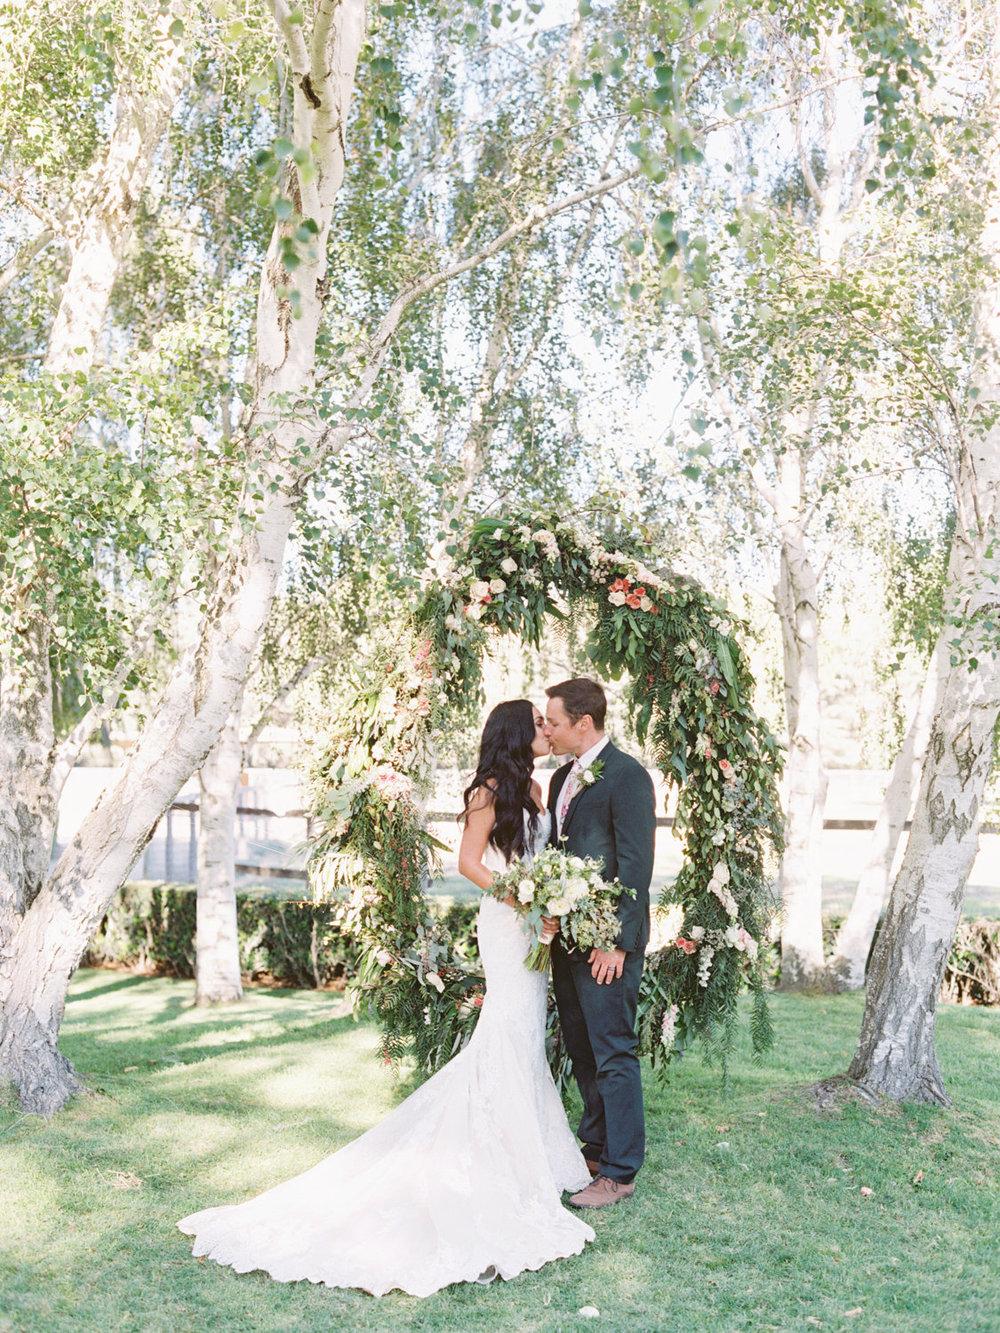 Jon-Cu-603002887-R1-E009-fim-california-wedding-top-santa-ynez-photographer-photography-solvang.jpg